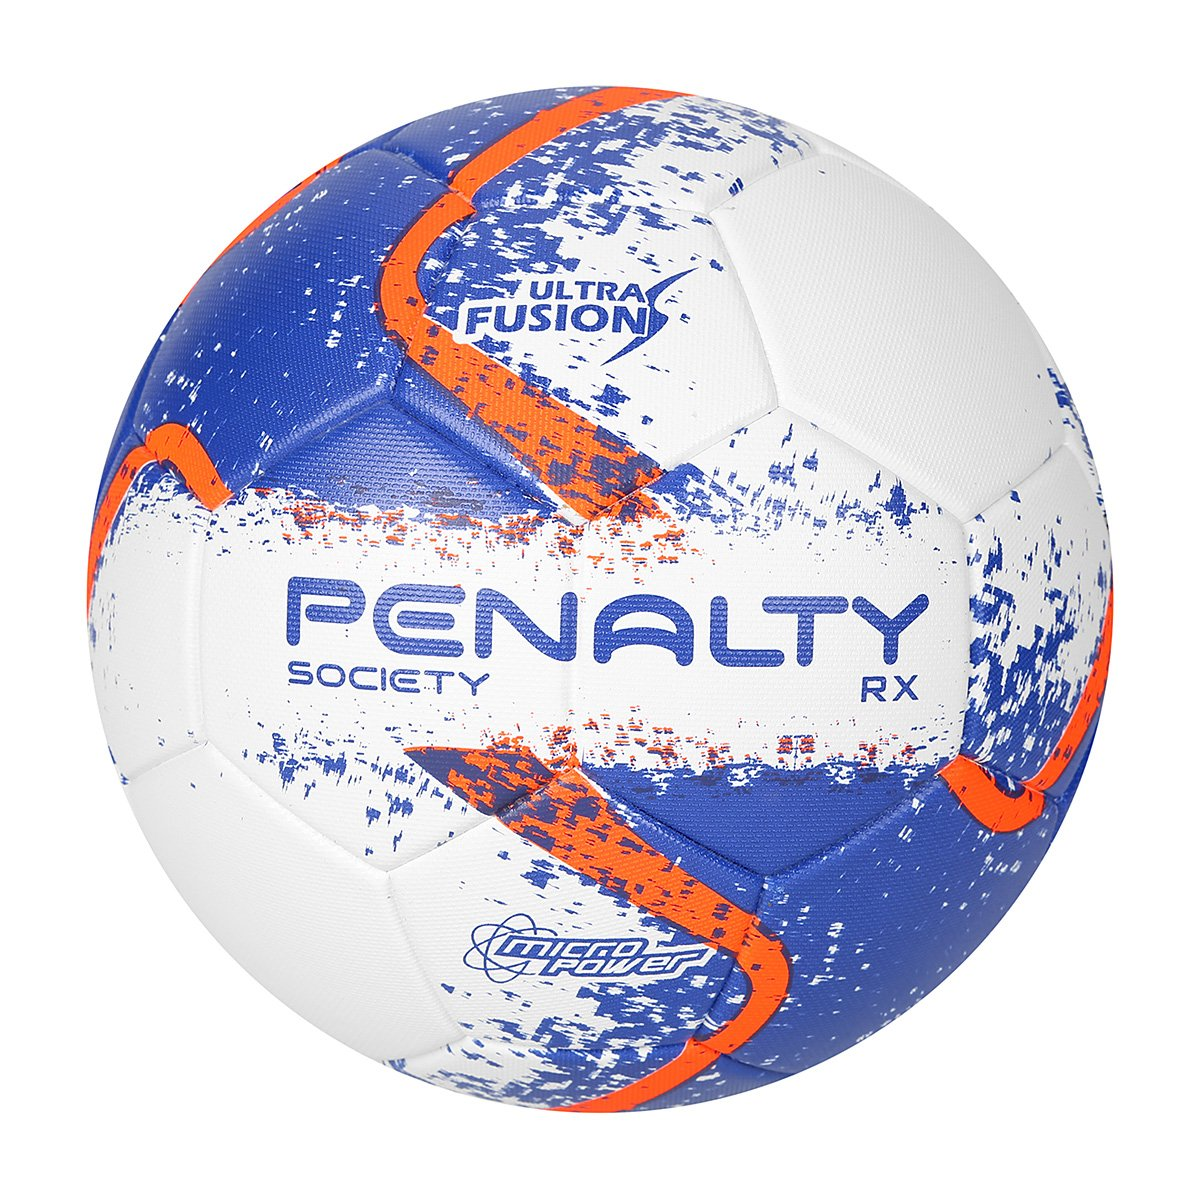 Bola Futebol Society Penalty RX R2 Ultra Fusion 7 - Compre Agora ... befb5f65e236d